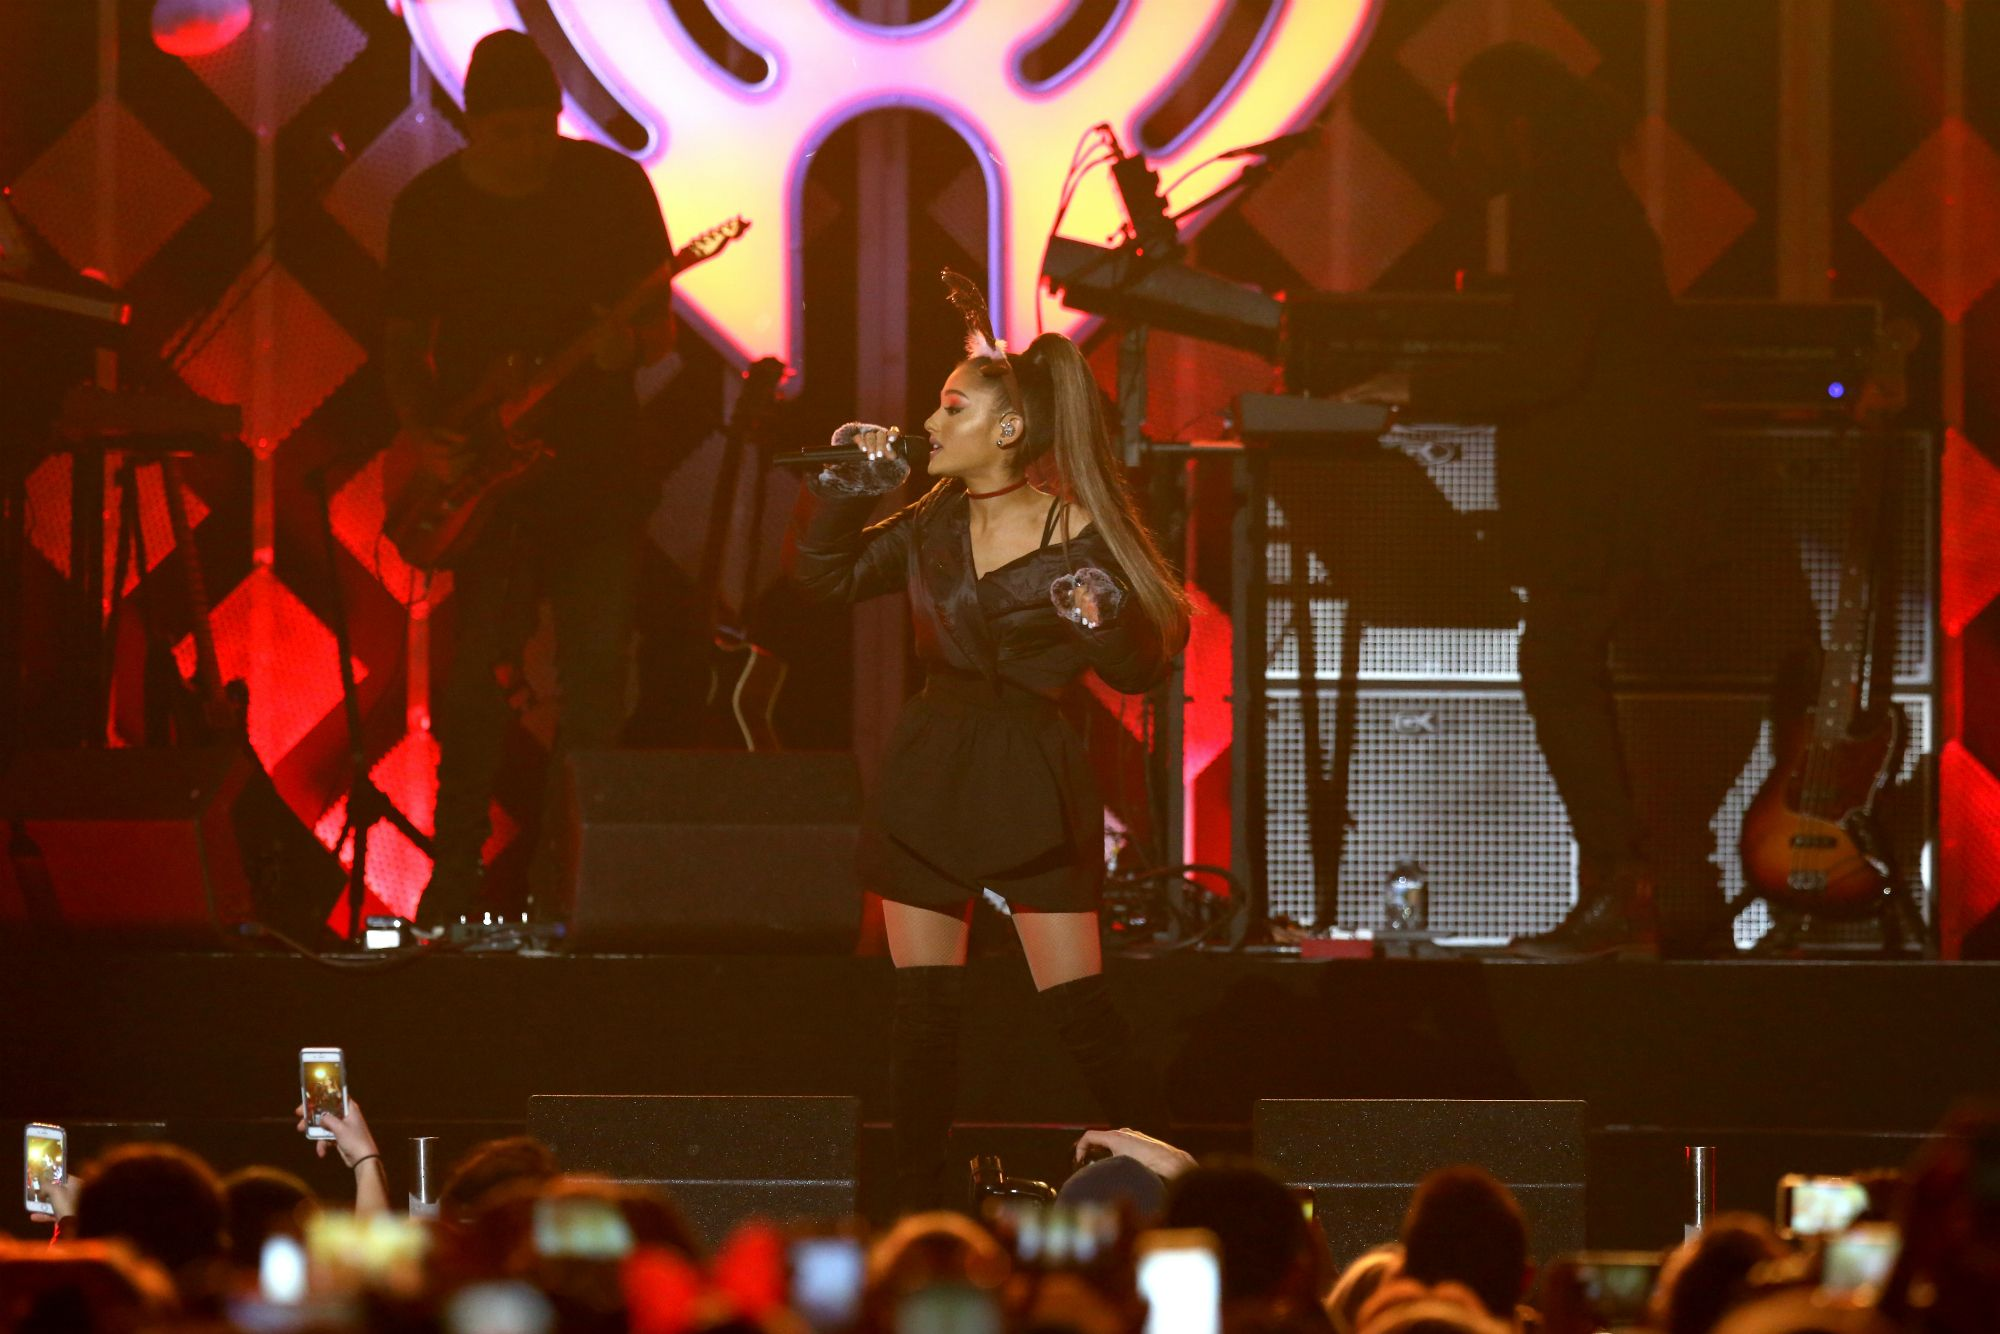 Ariana Grande responds to Manchester attack